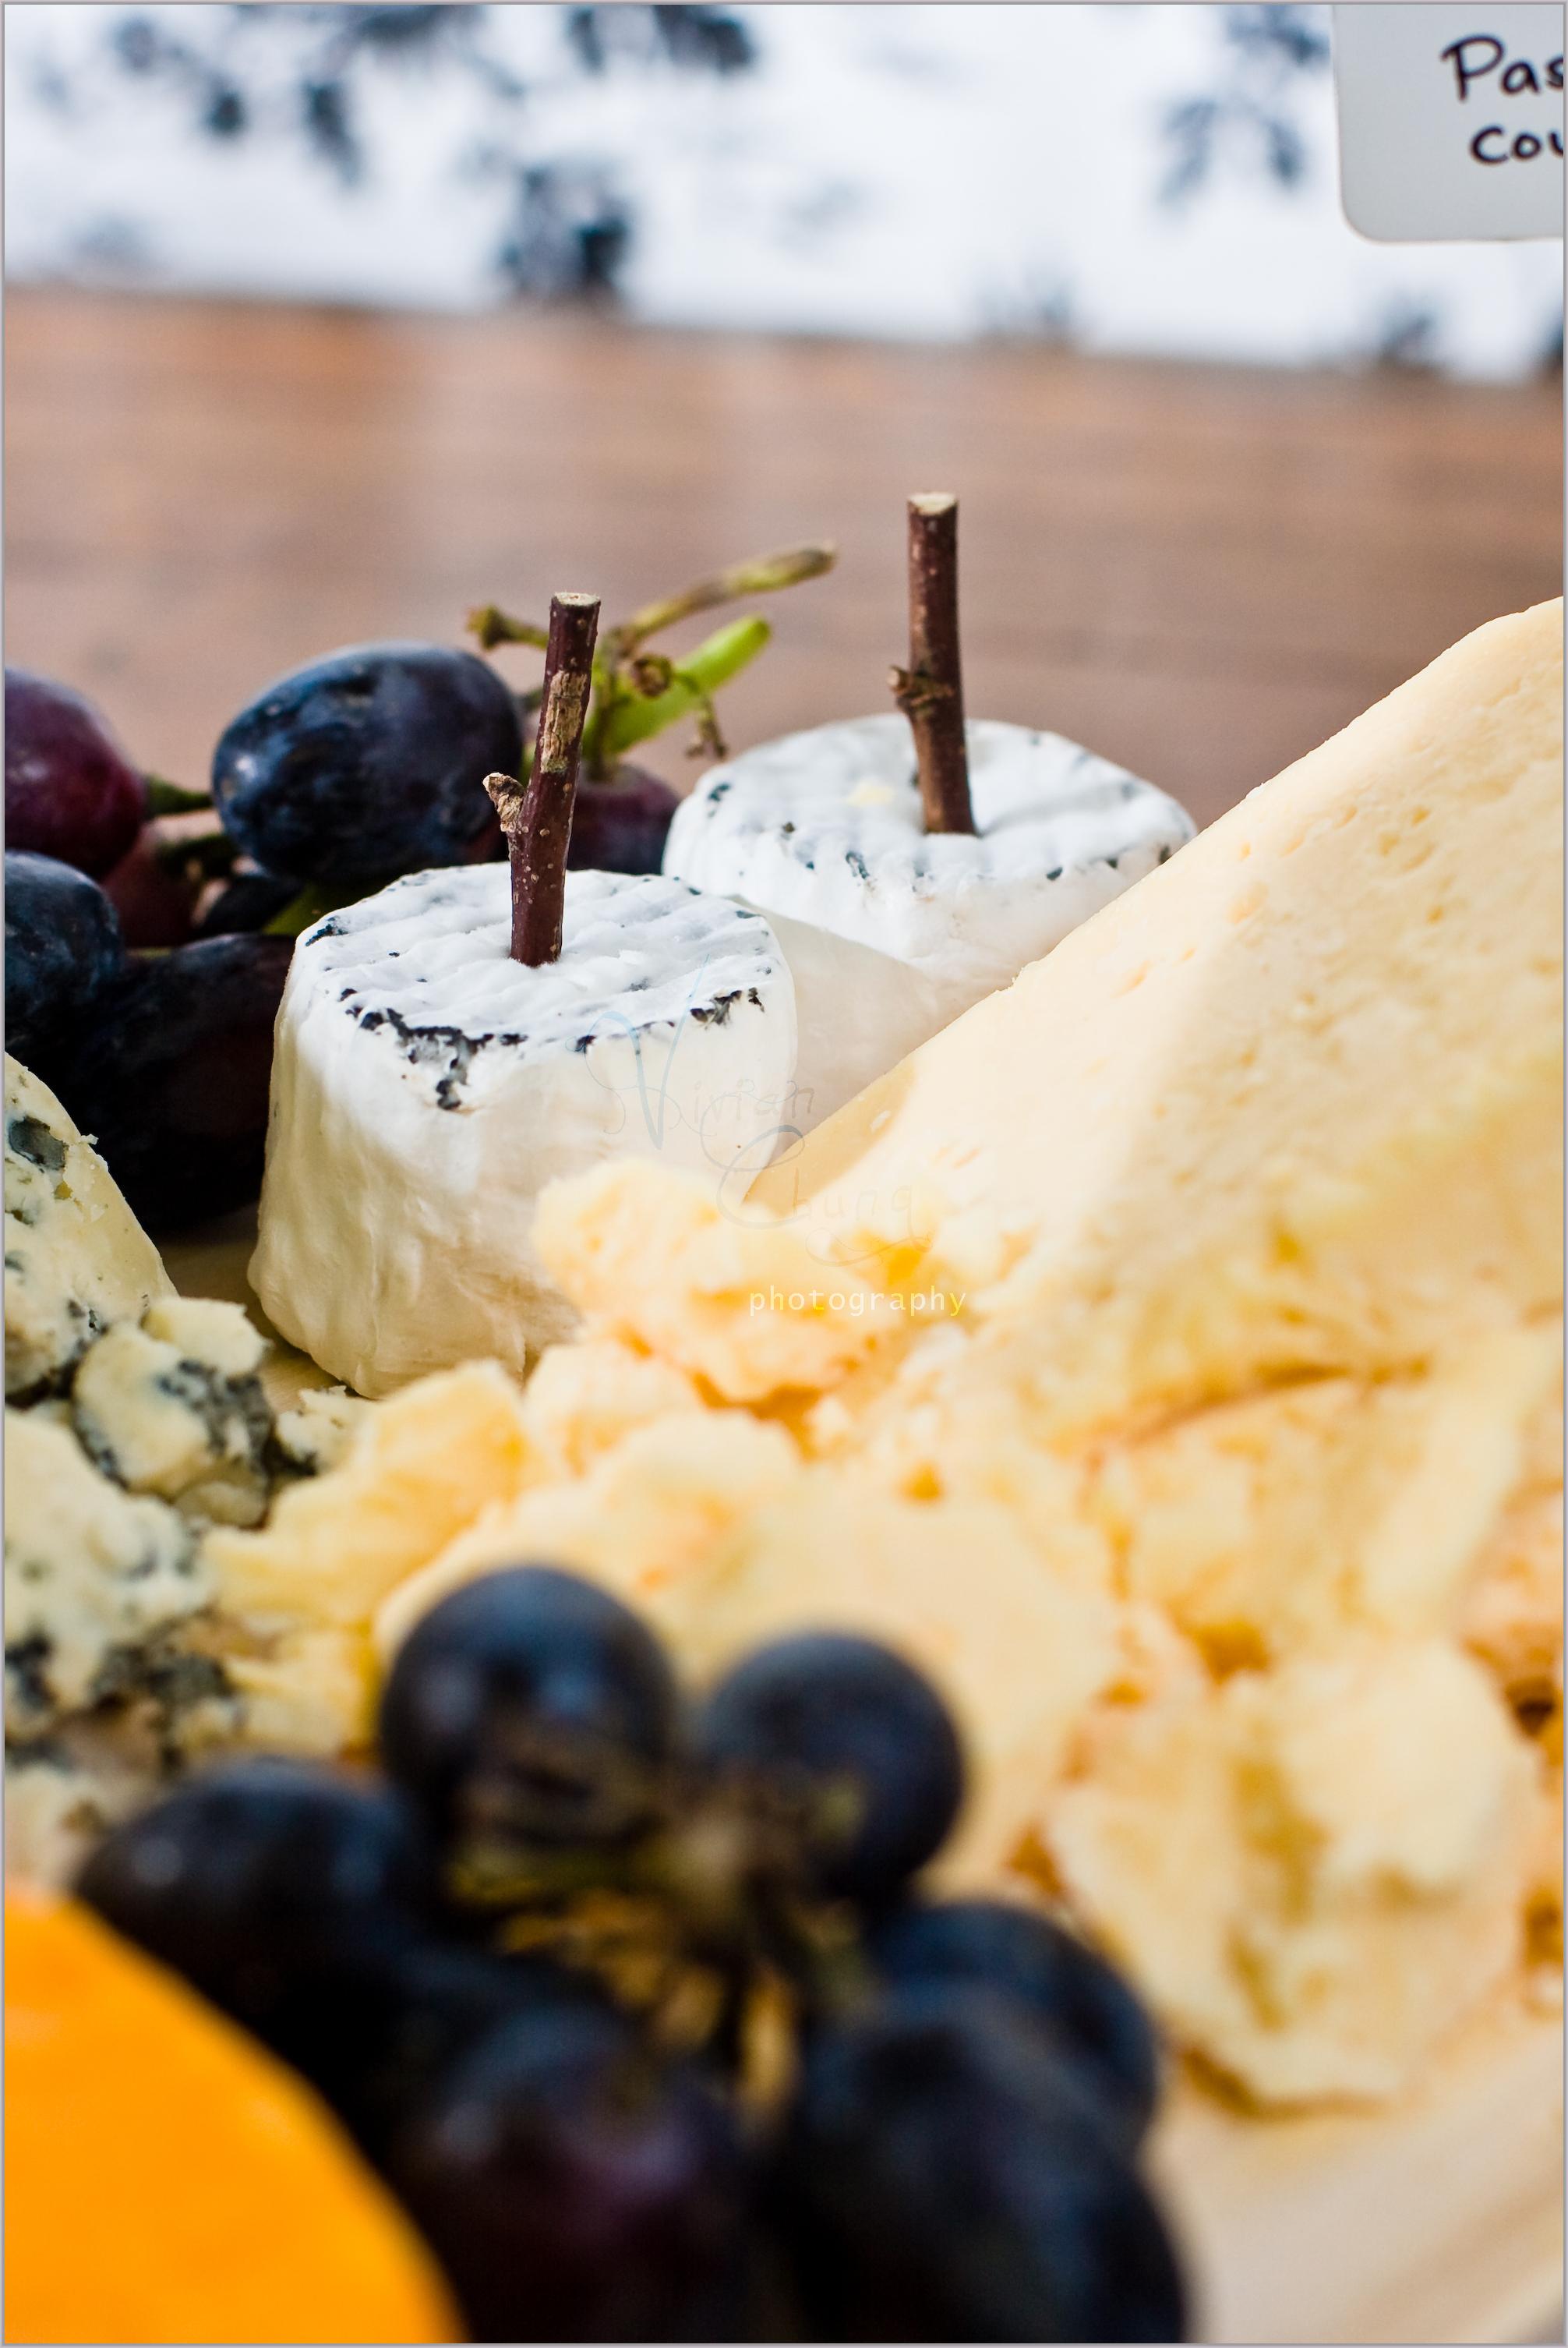 mpc-cheese-platter-361